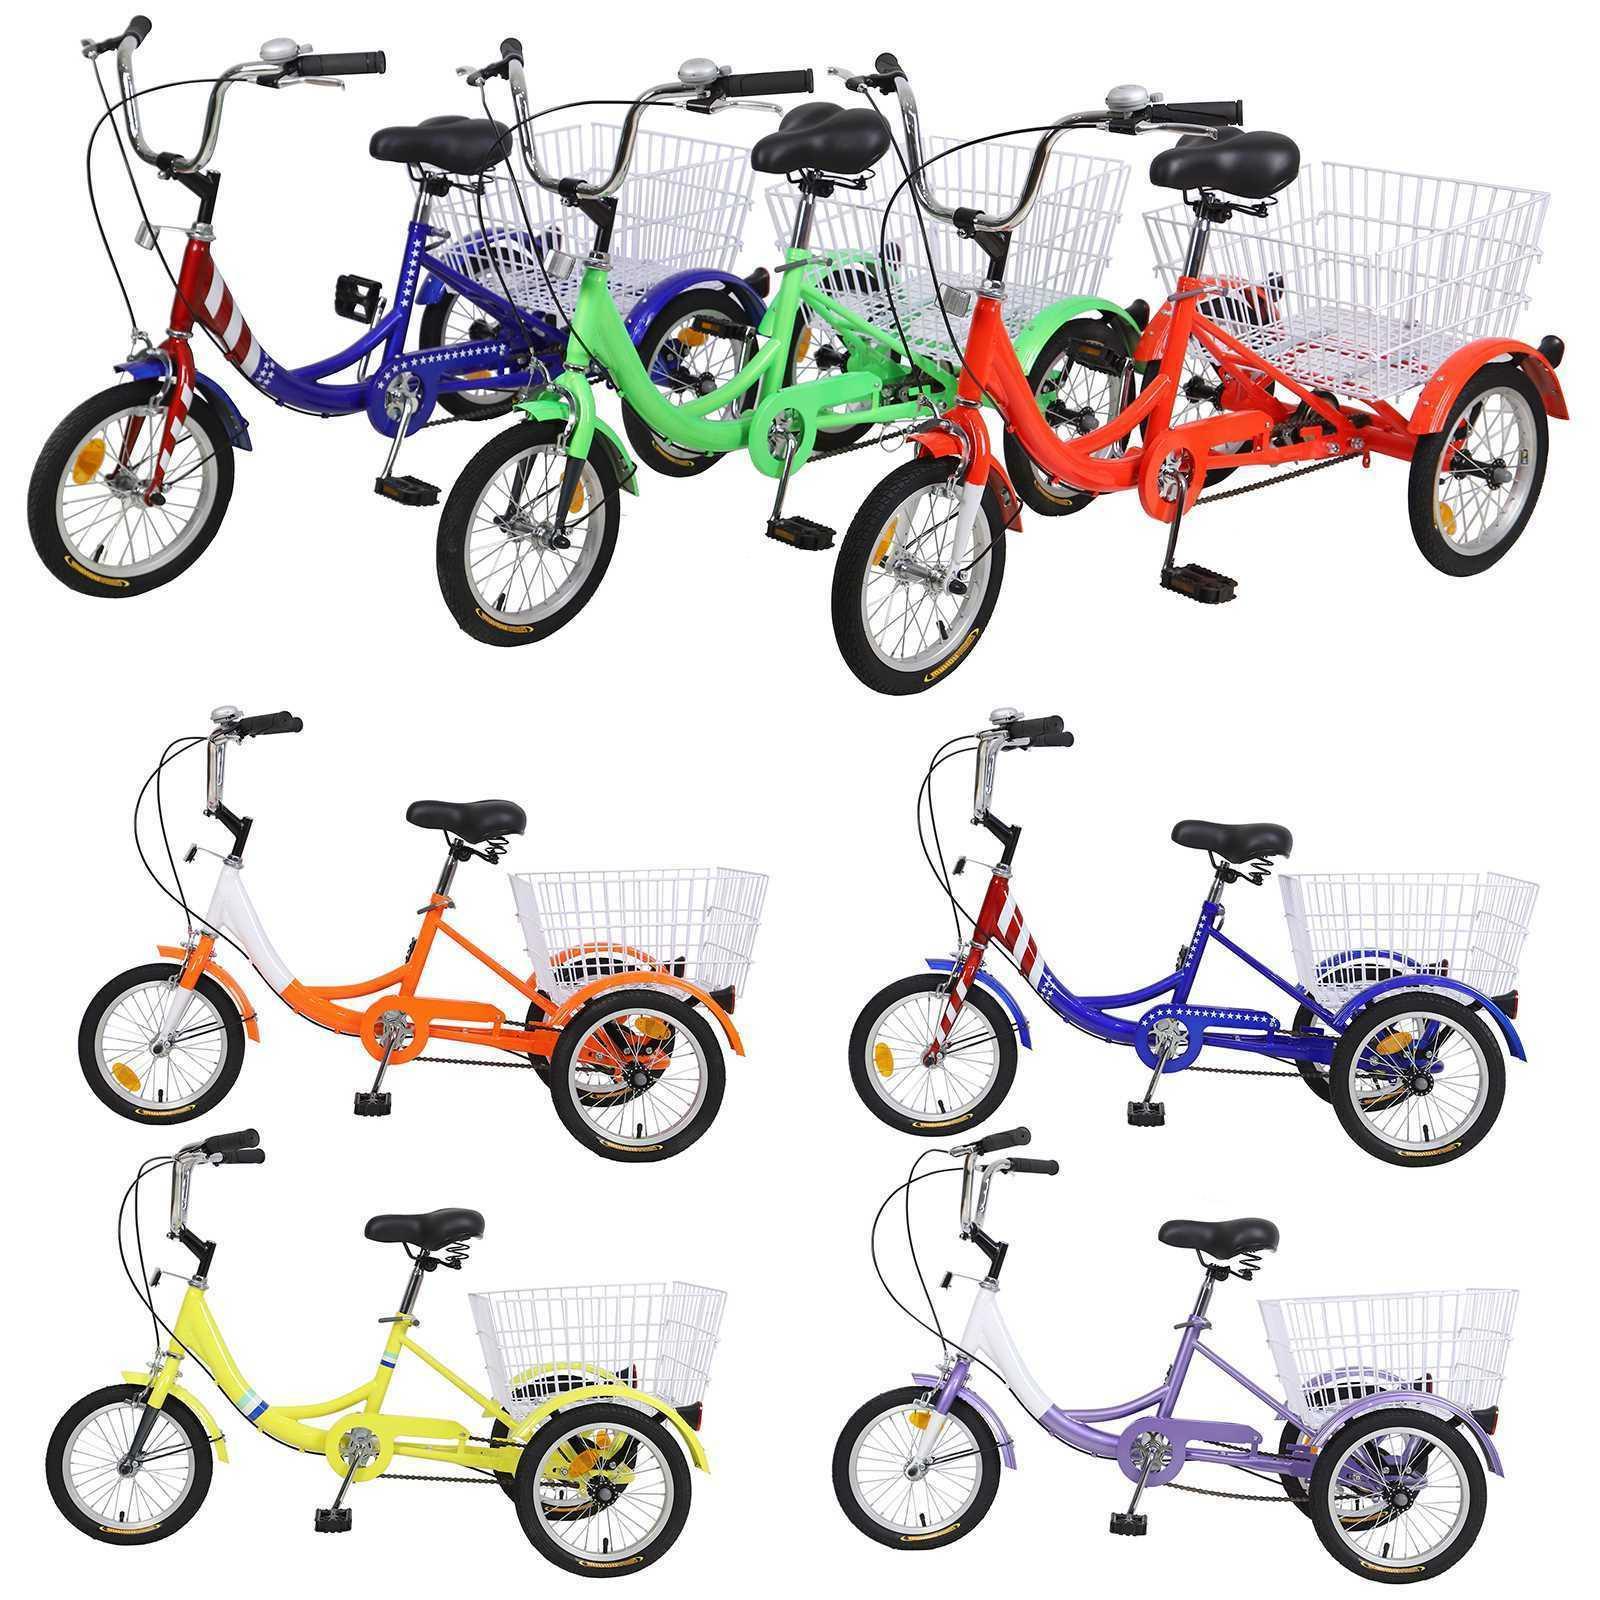 Kids Youth Teenagers 14'' 16'' 3-Wheel Tricycle Trike Bicycl